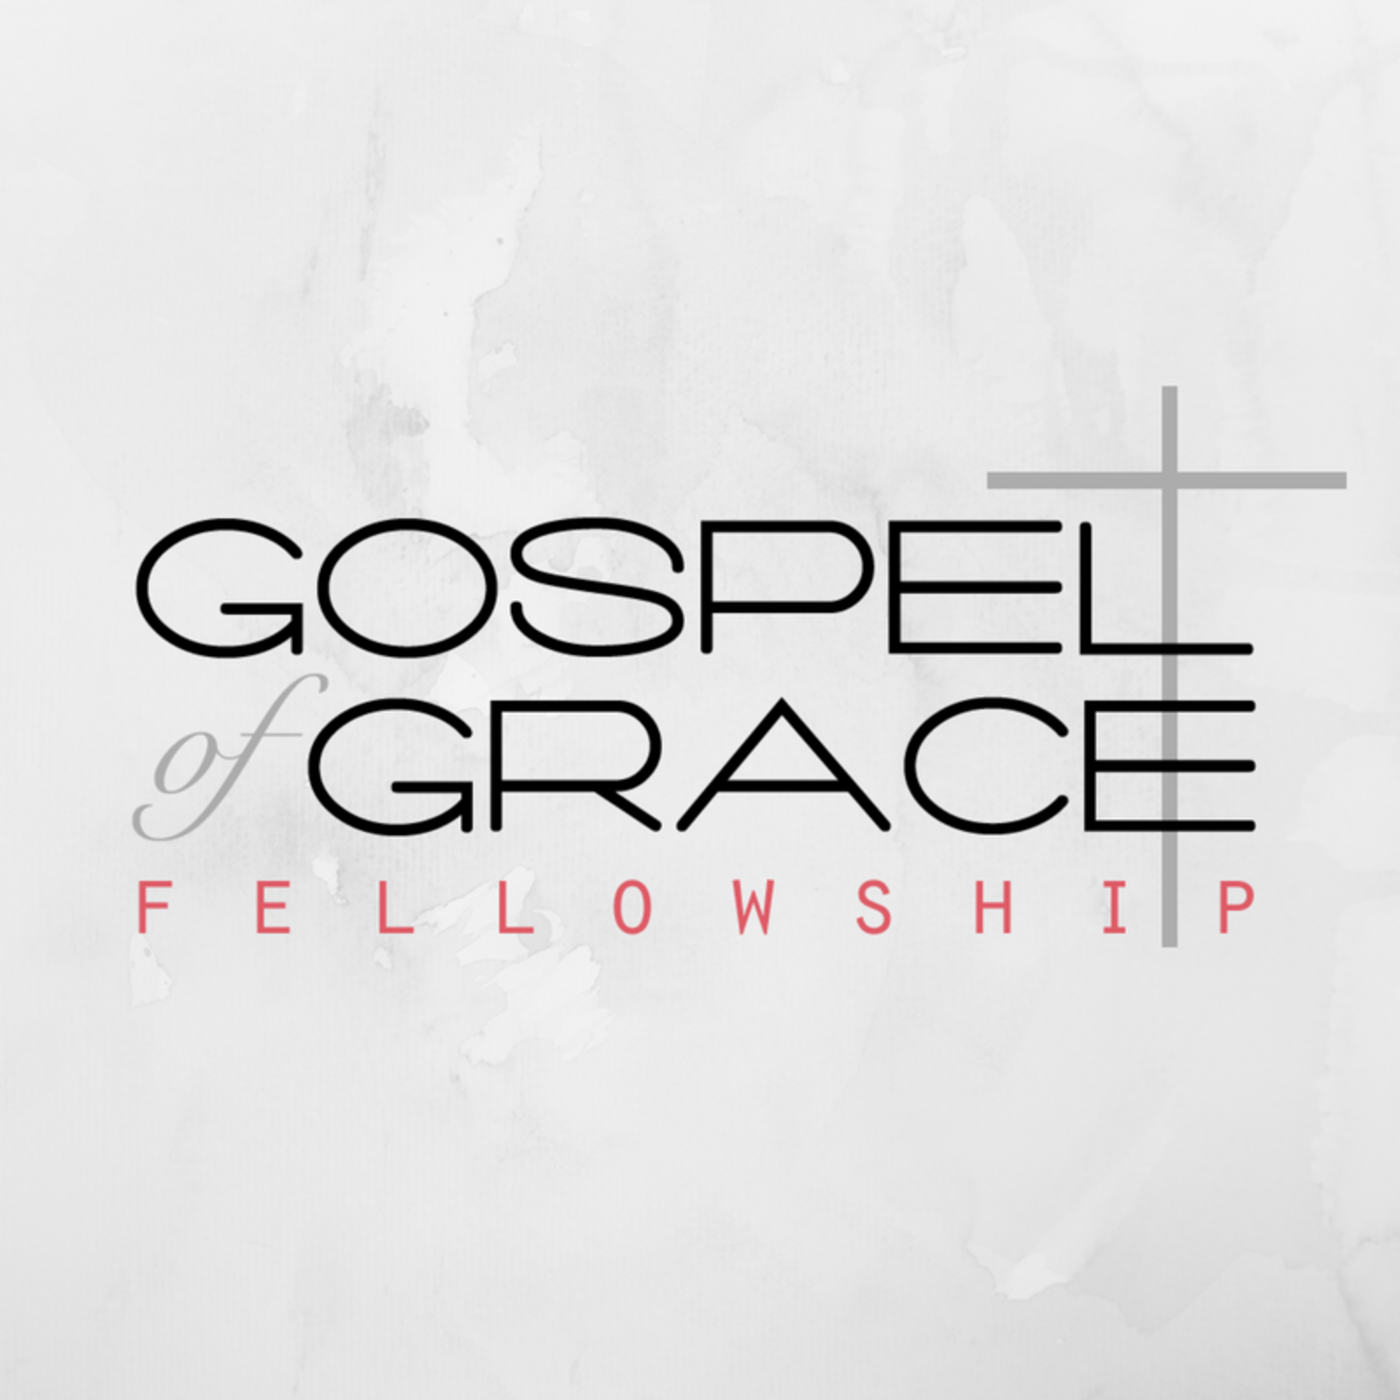 Gospel of Grace Fellowship, Weyburn SK